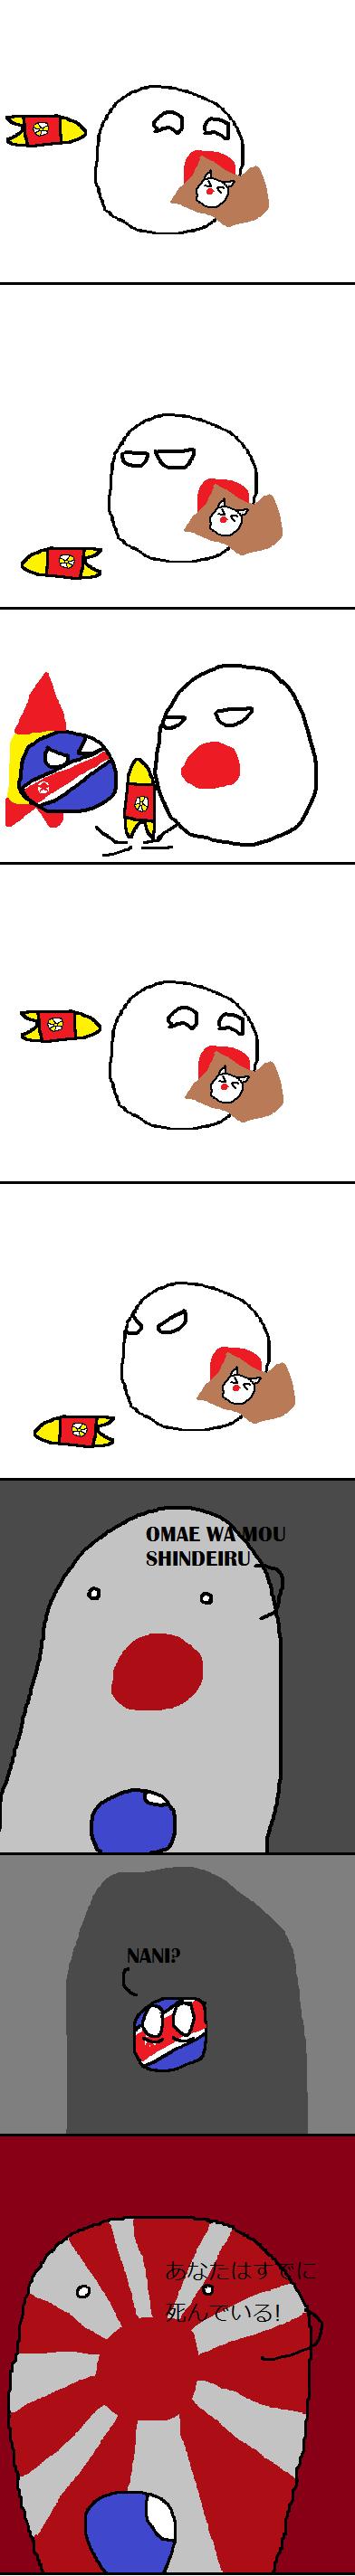 OMAE WA MOU SHINDEIRU? | Funny memes, Mou, Funny